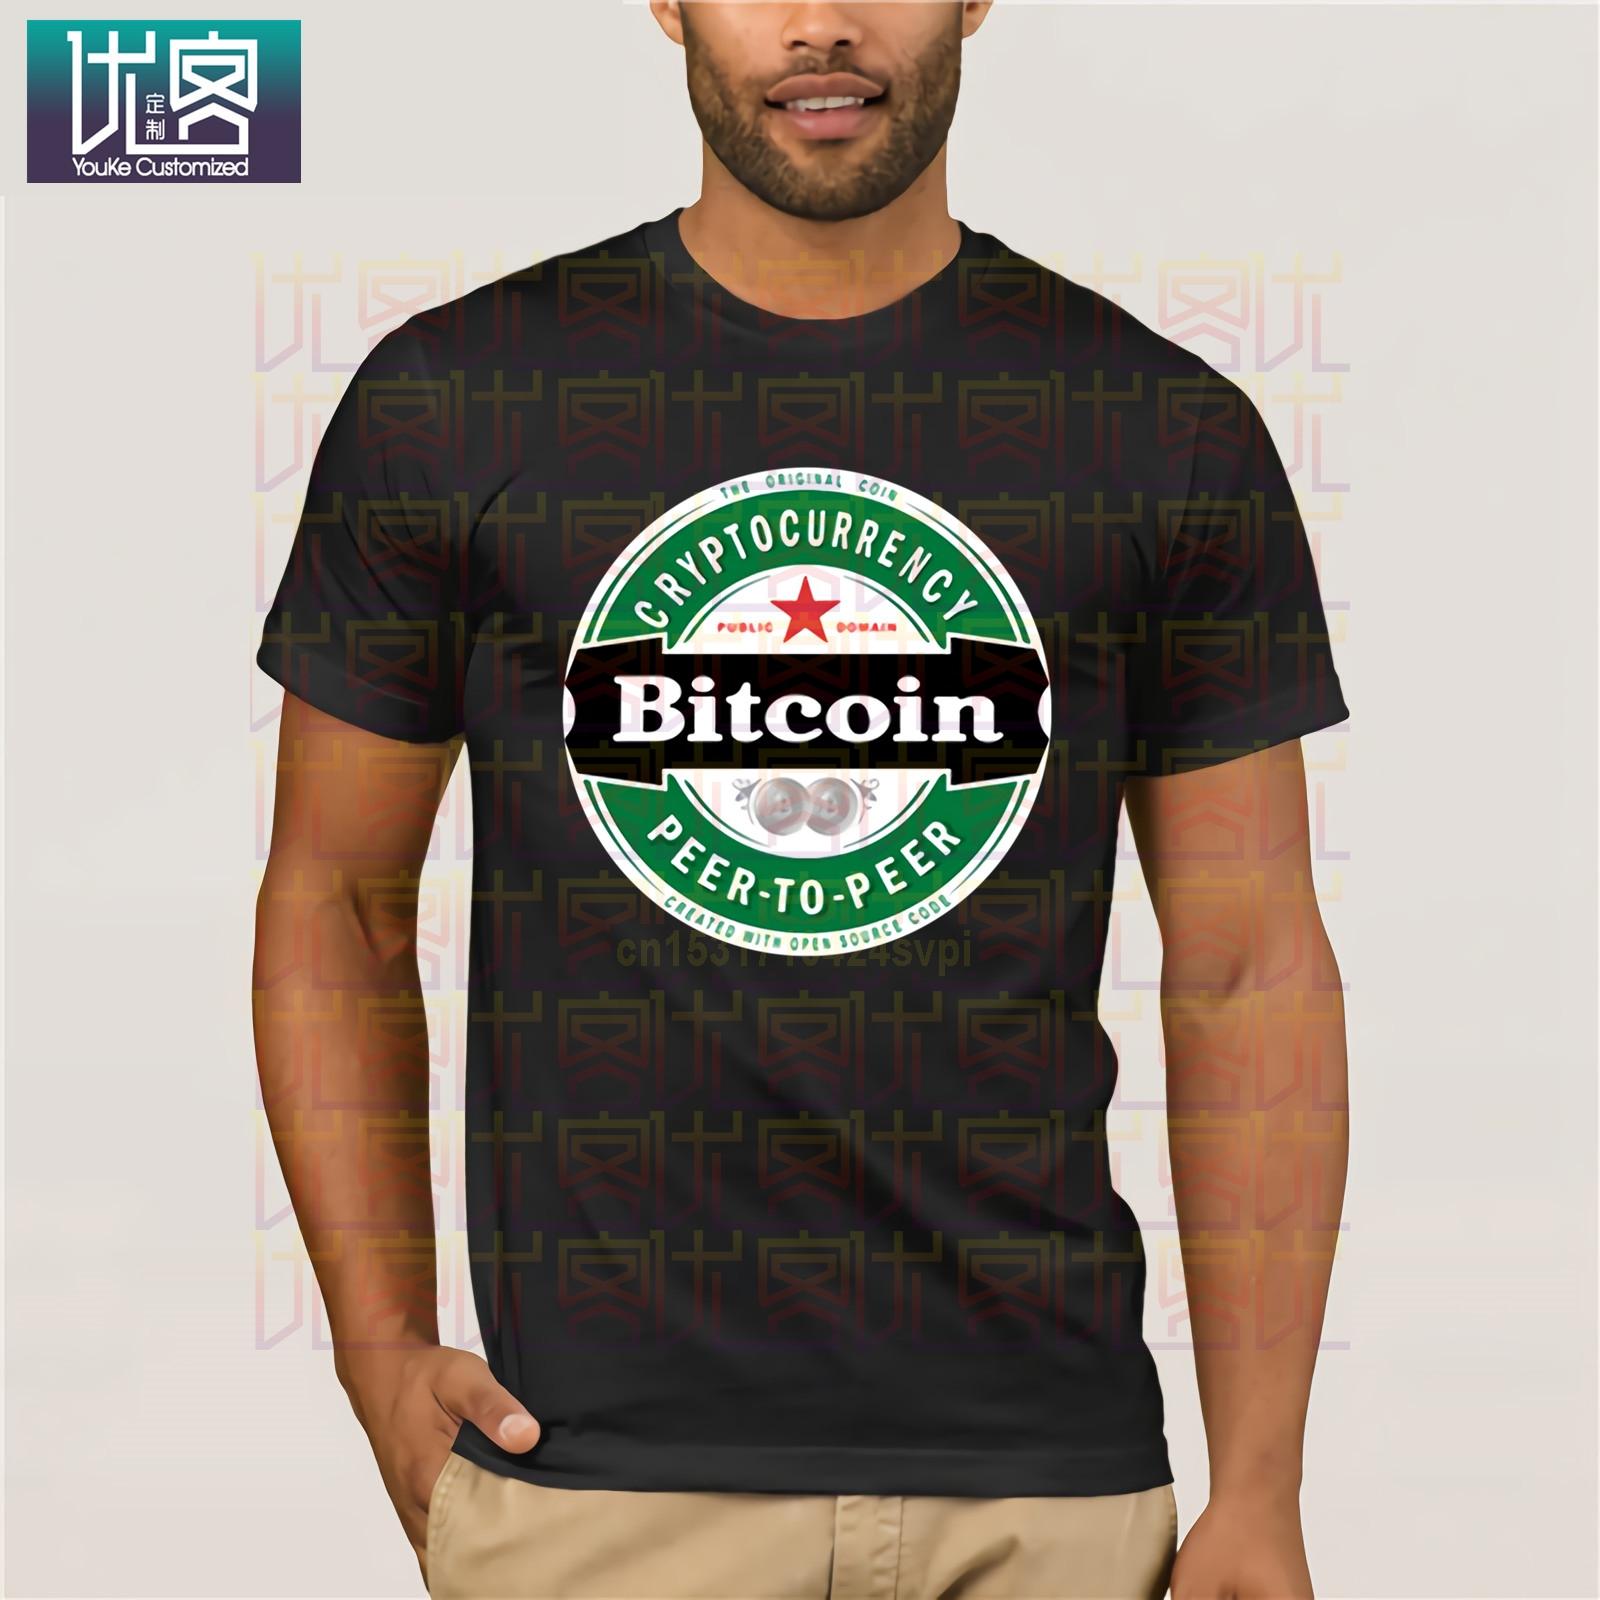 mining la linea di t-shirt per veri minatori di Bitcoin